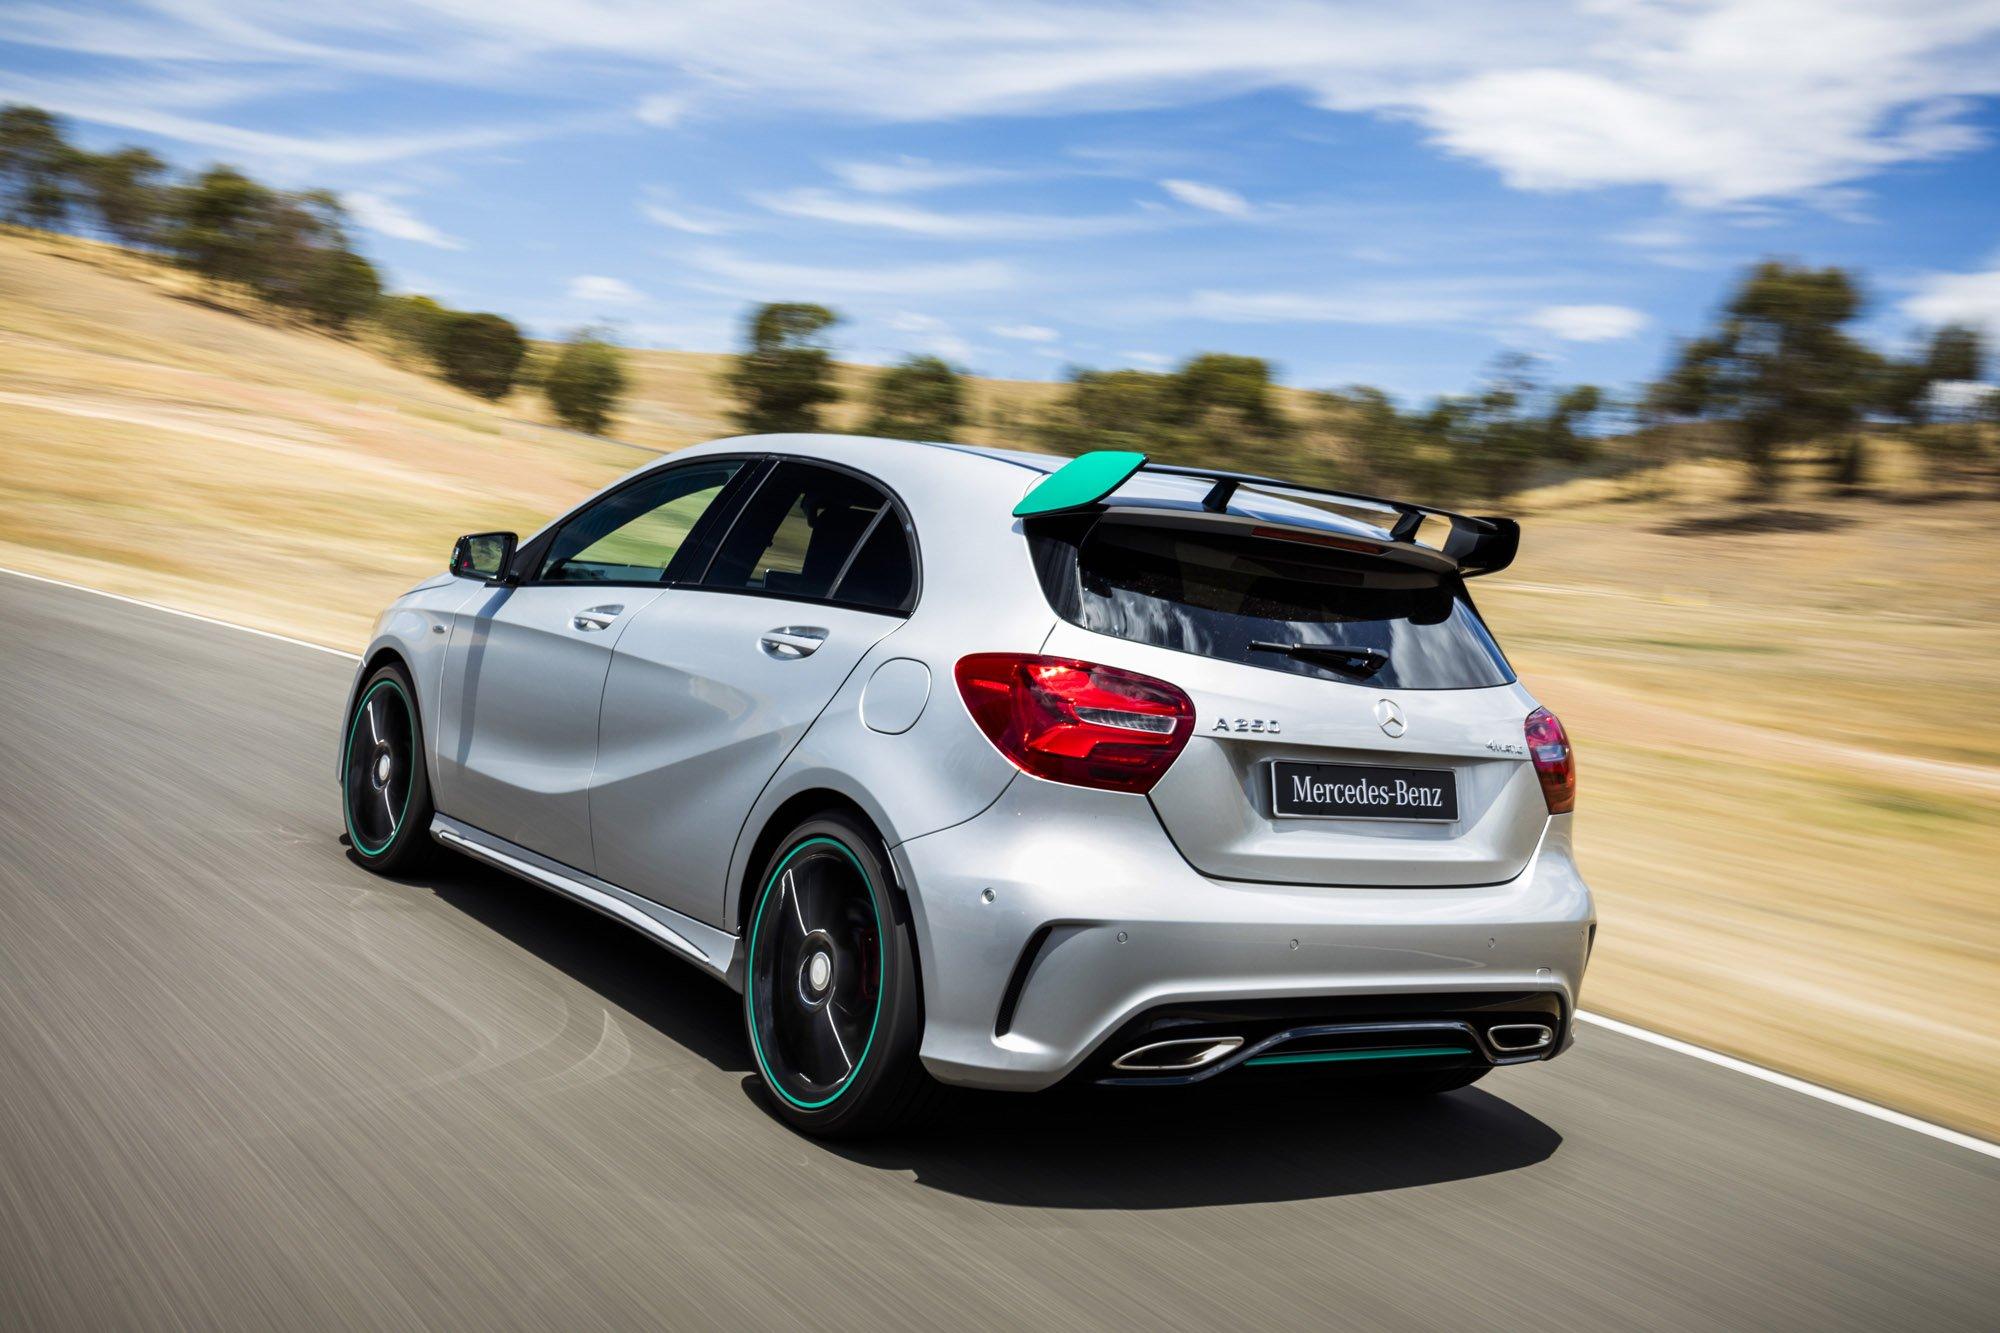 2016 mercedes benz a class review caradvice for Mercedes benz mbrace reviews